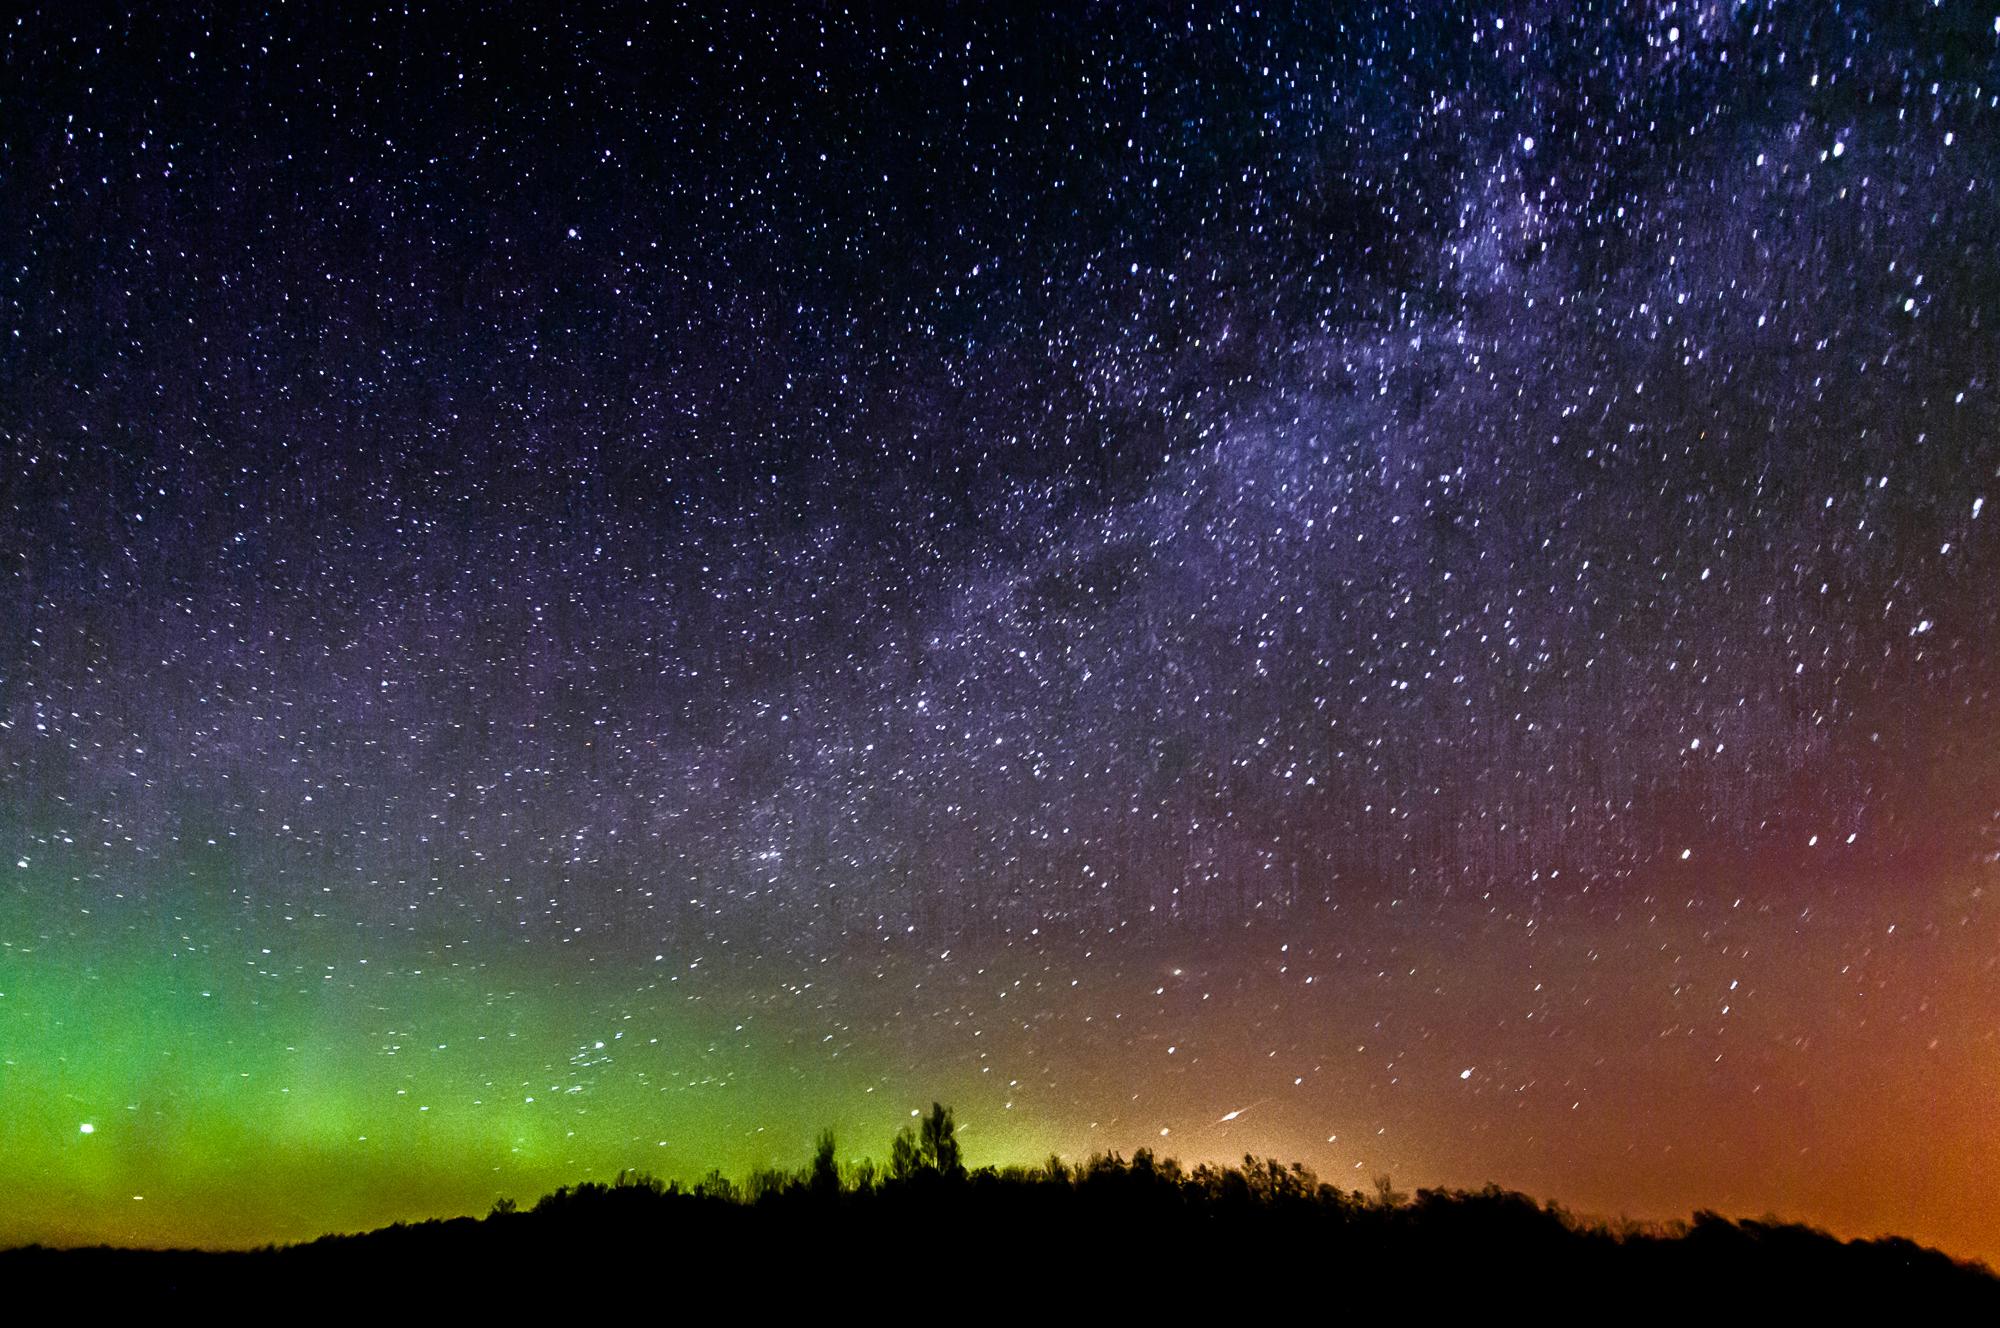 Cosmic Anniversary, Stellar Cannibals & More